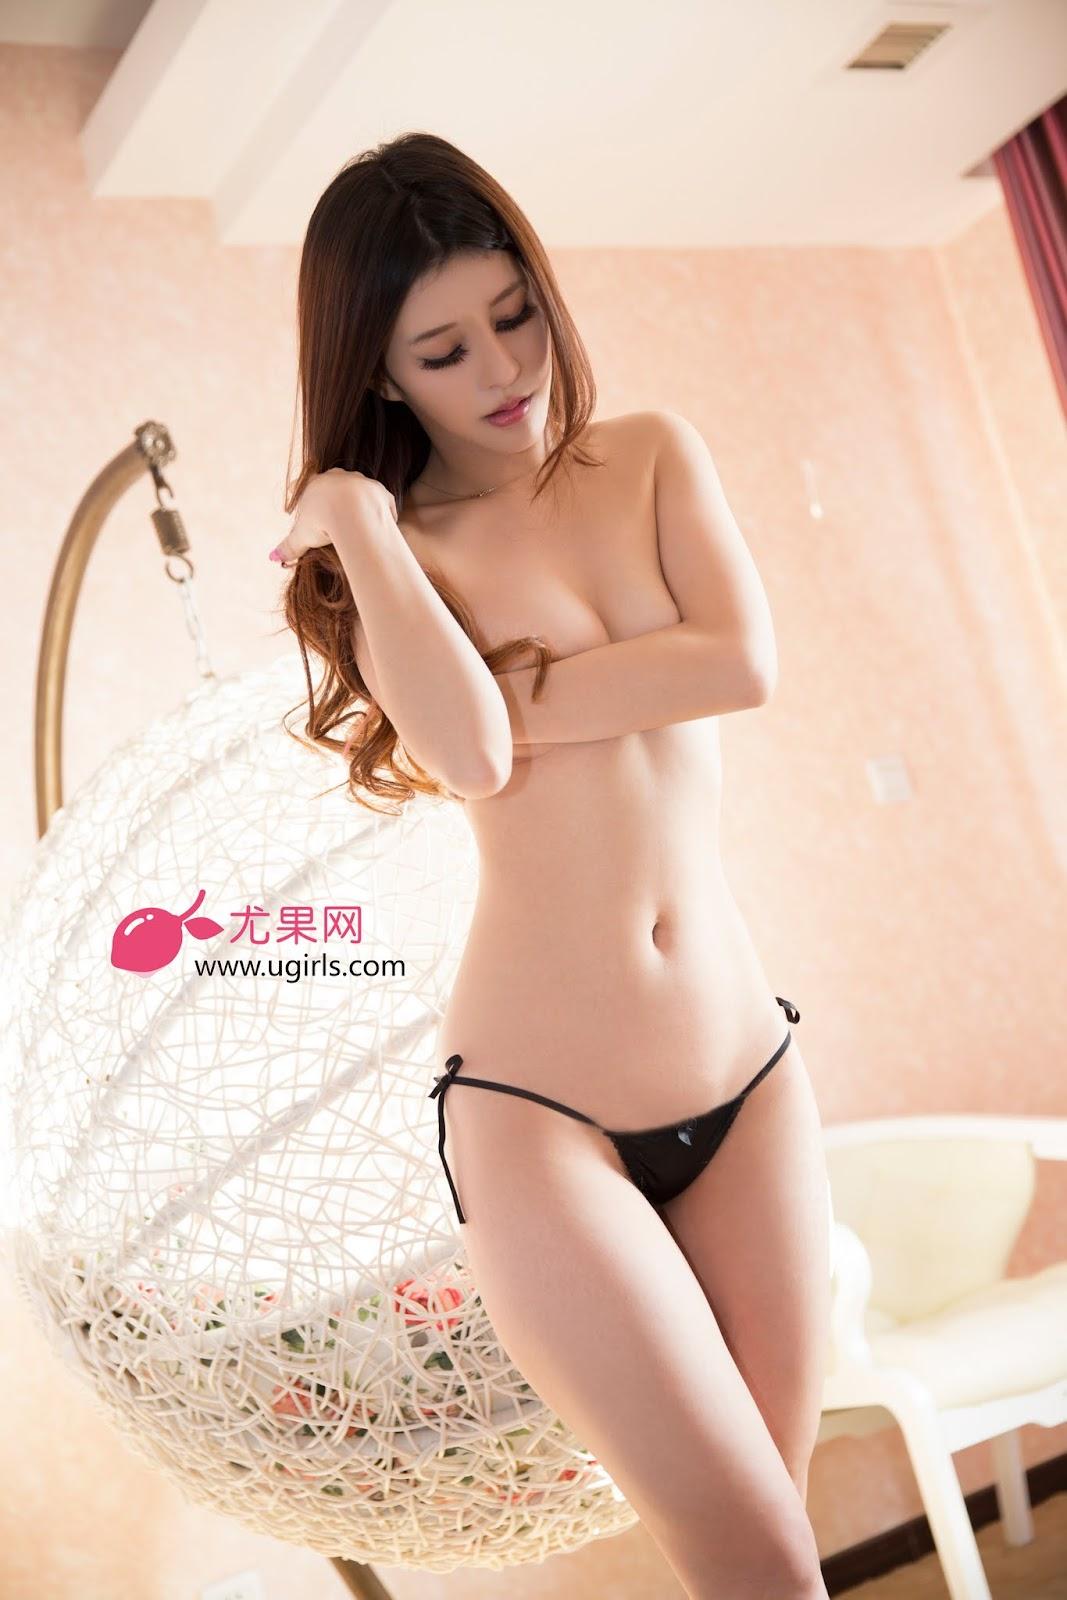 A14A6207 - Hot Photo UGIRLS NO.5 Nude Girl